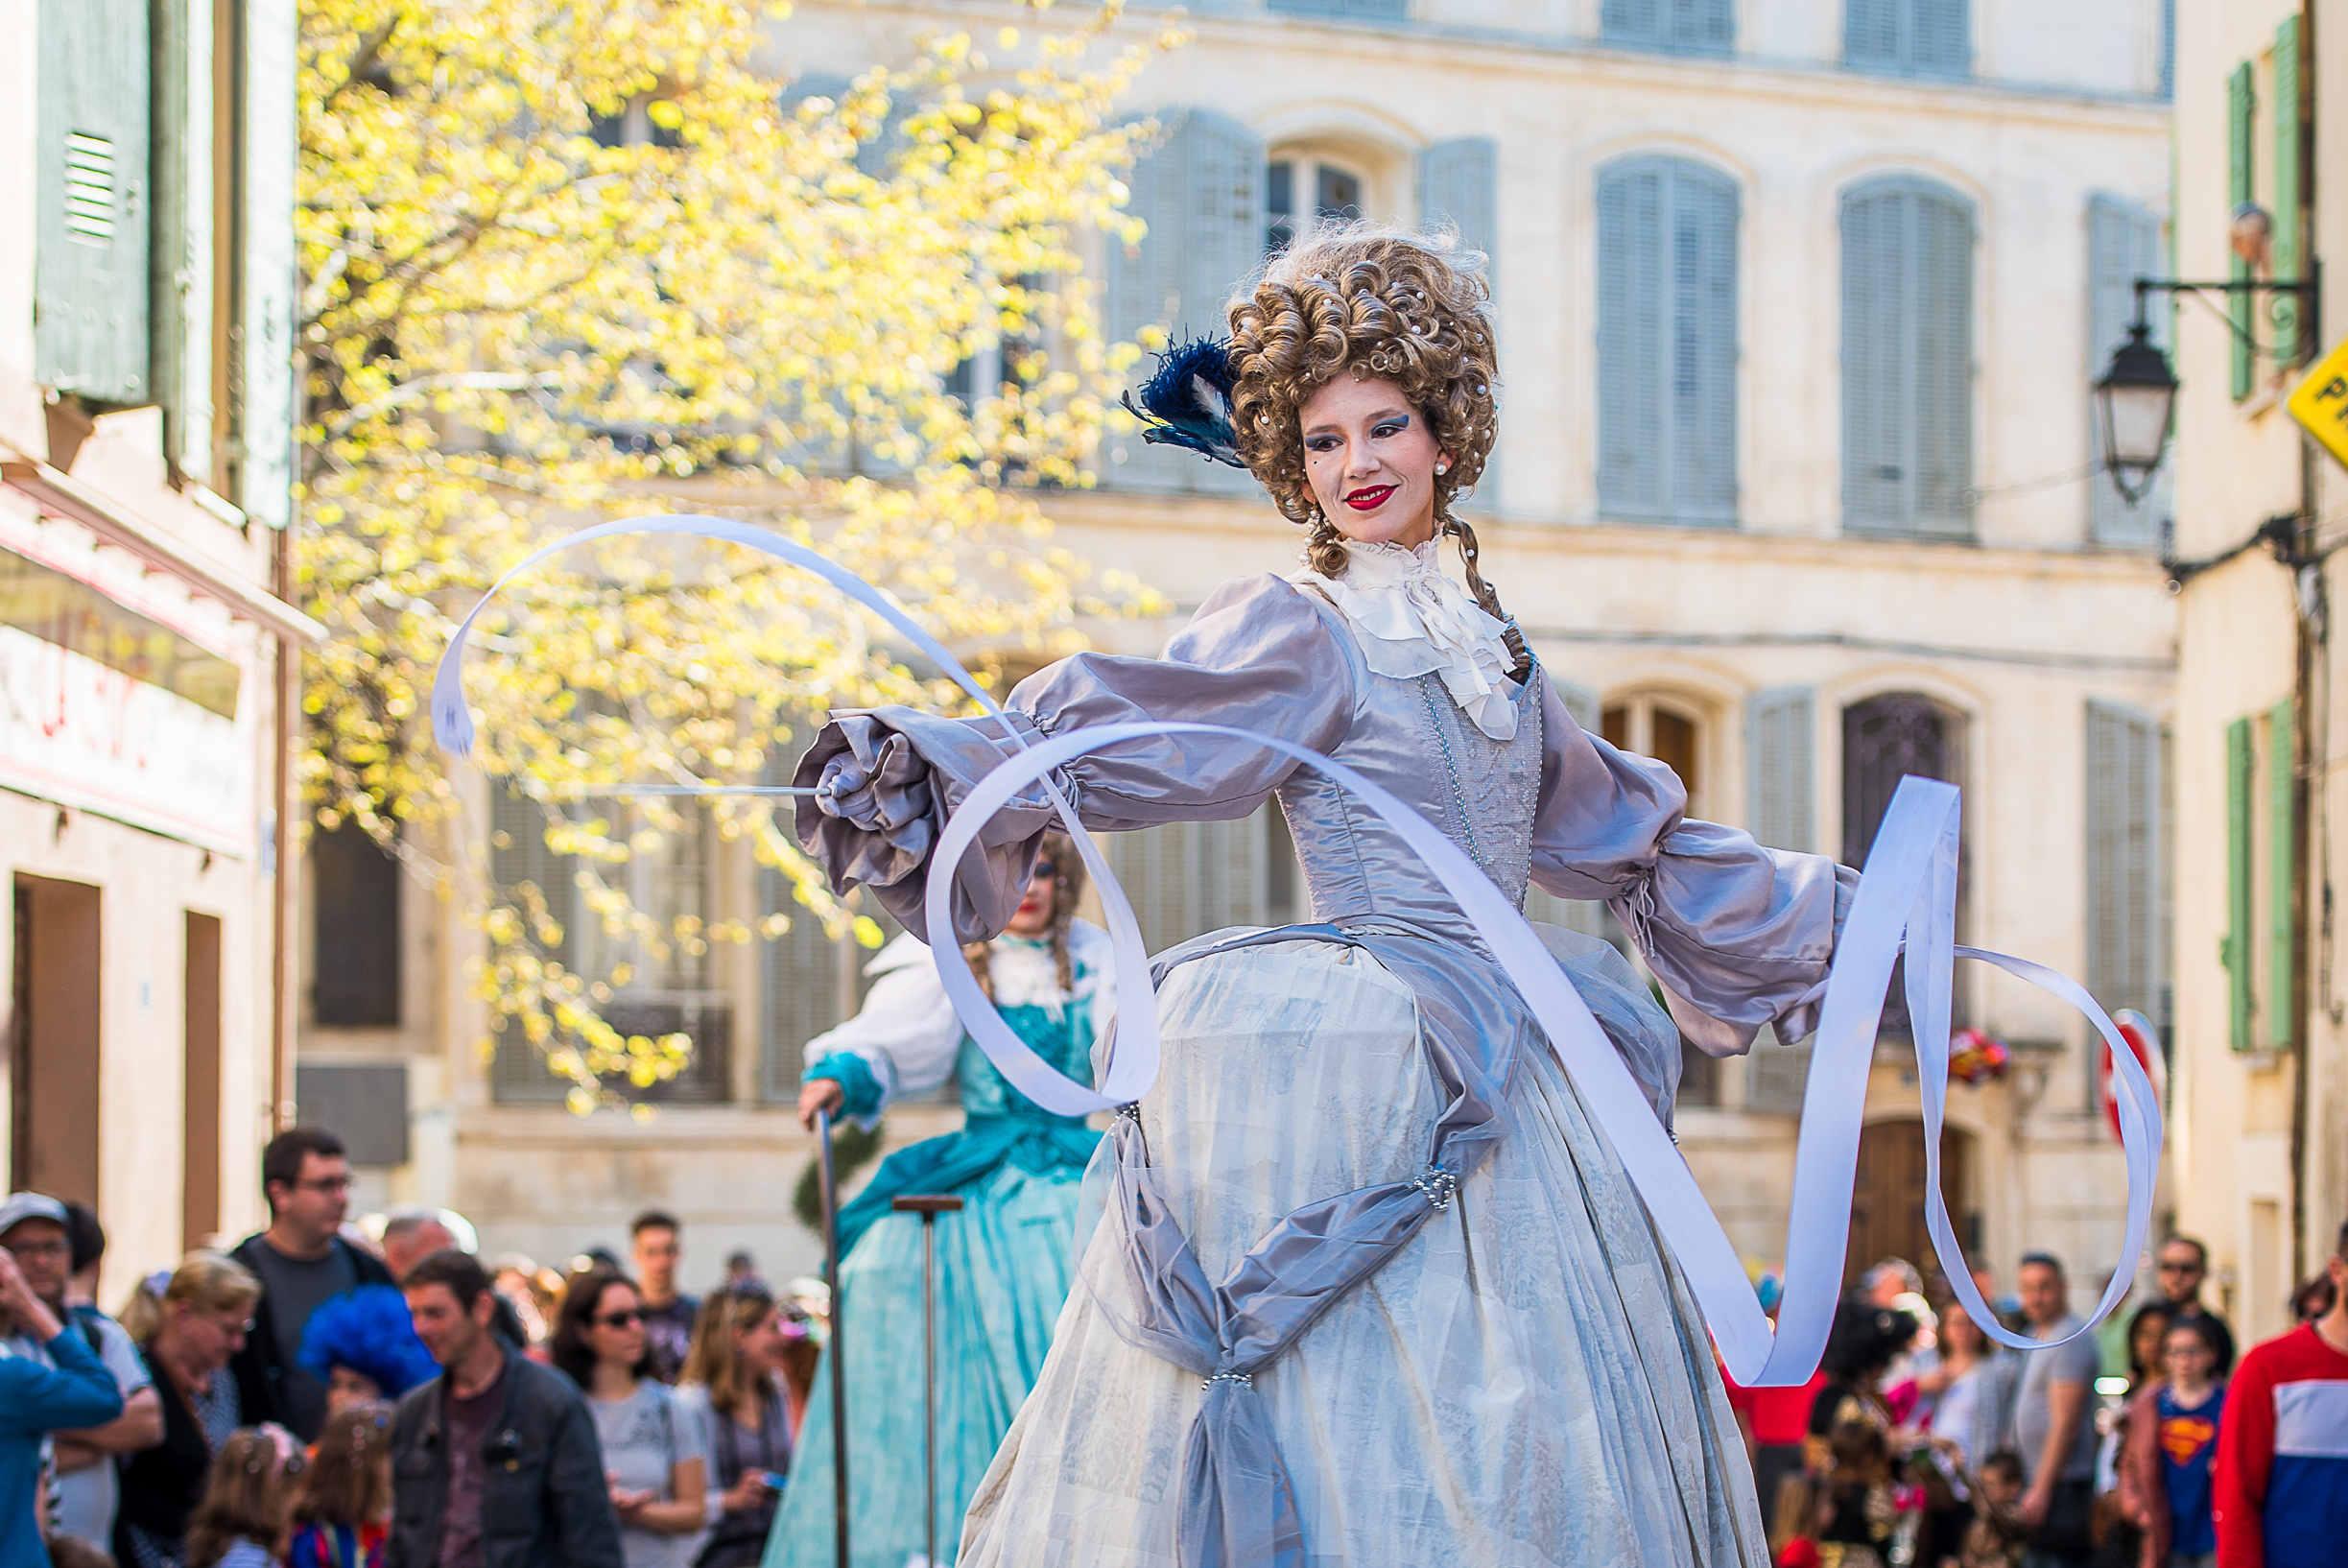 animation-de-rue-carnaval-echassier-jongleur-baroque-cirque-indigo